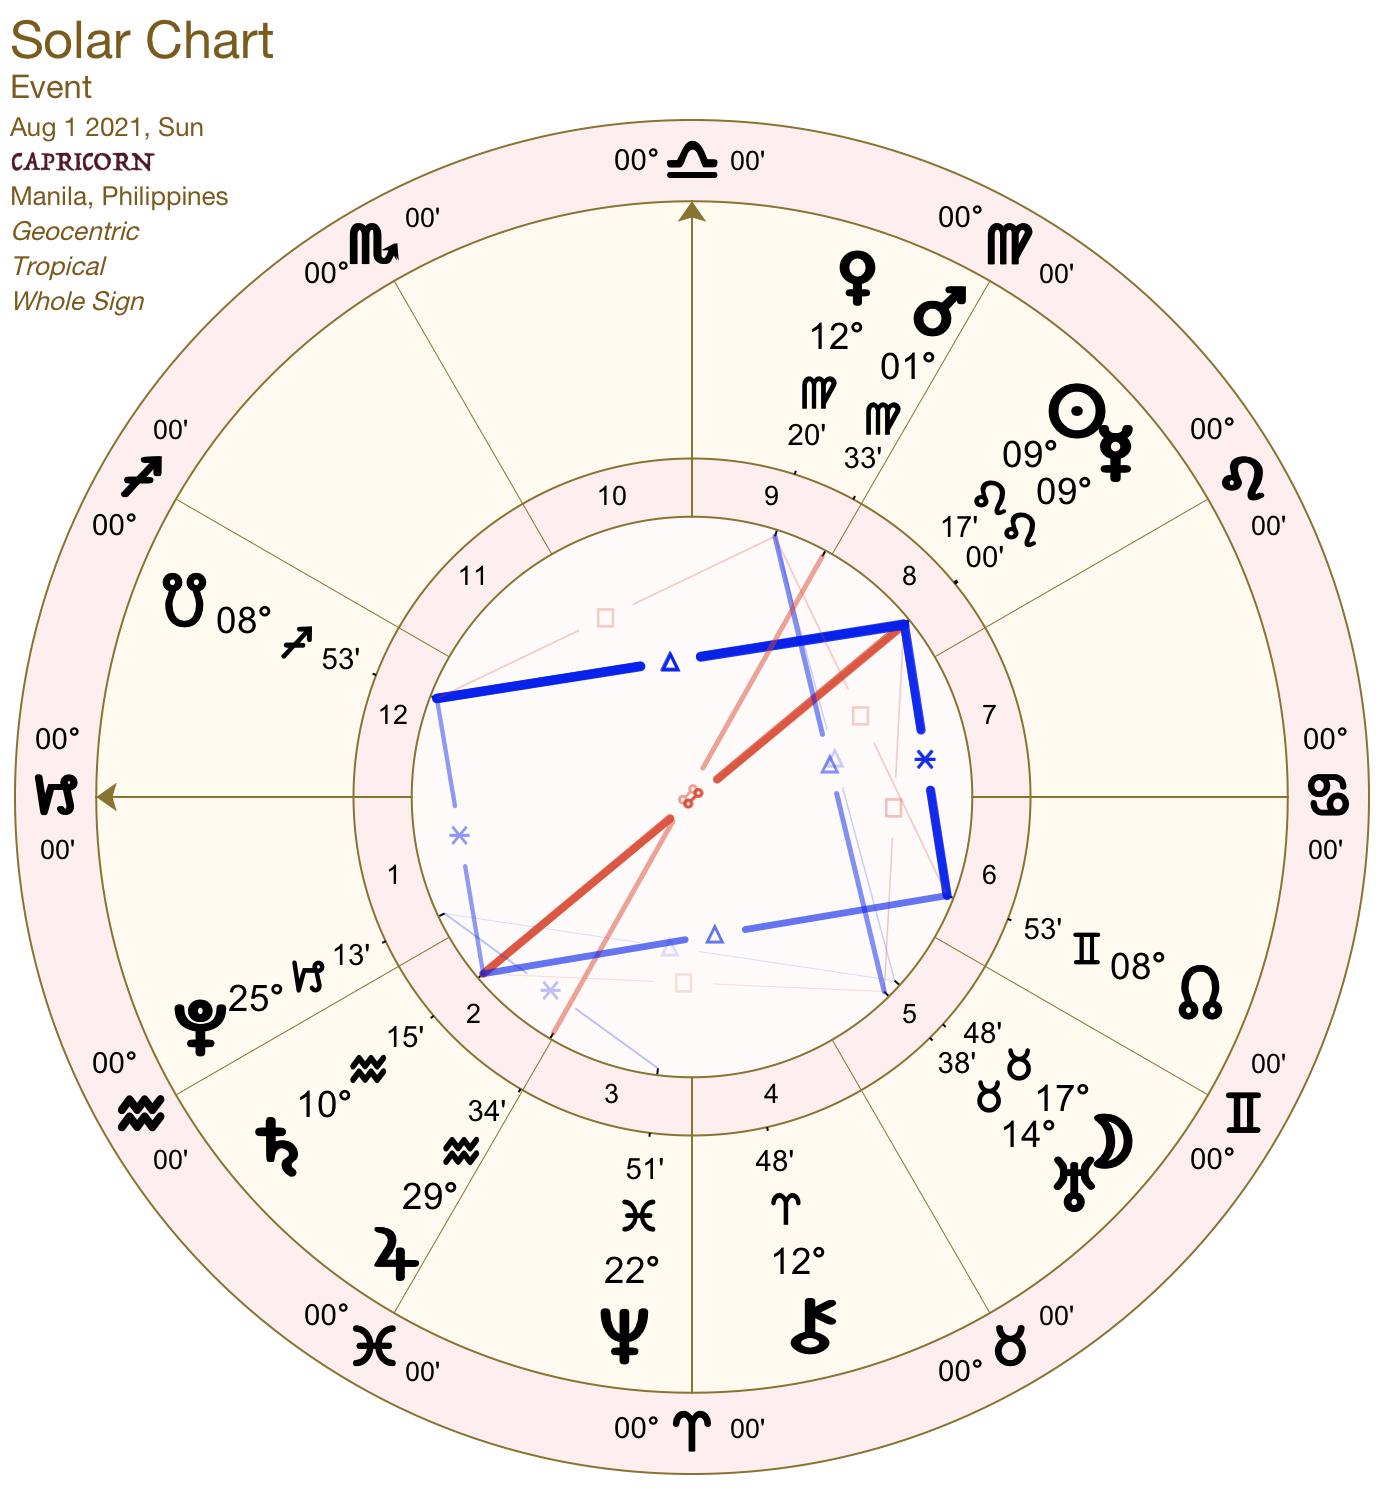 2021 08:Solar Chart:10 Capricorn